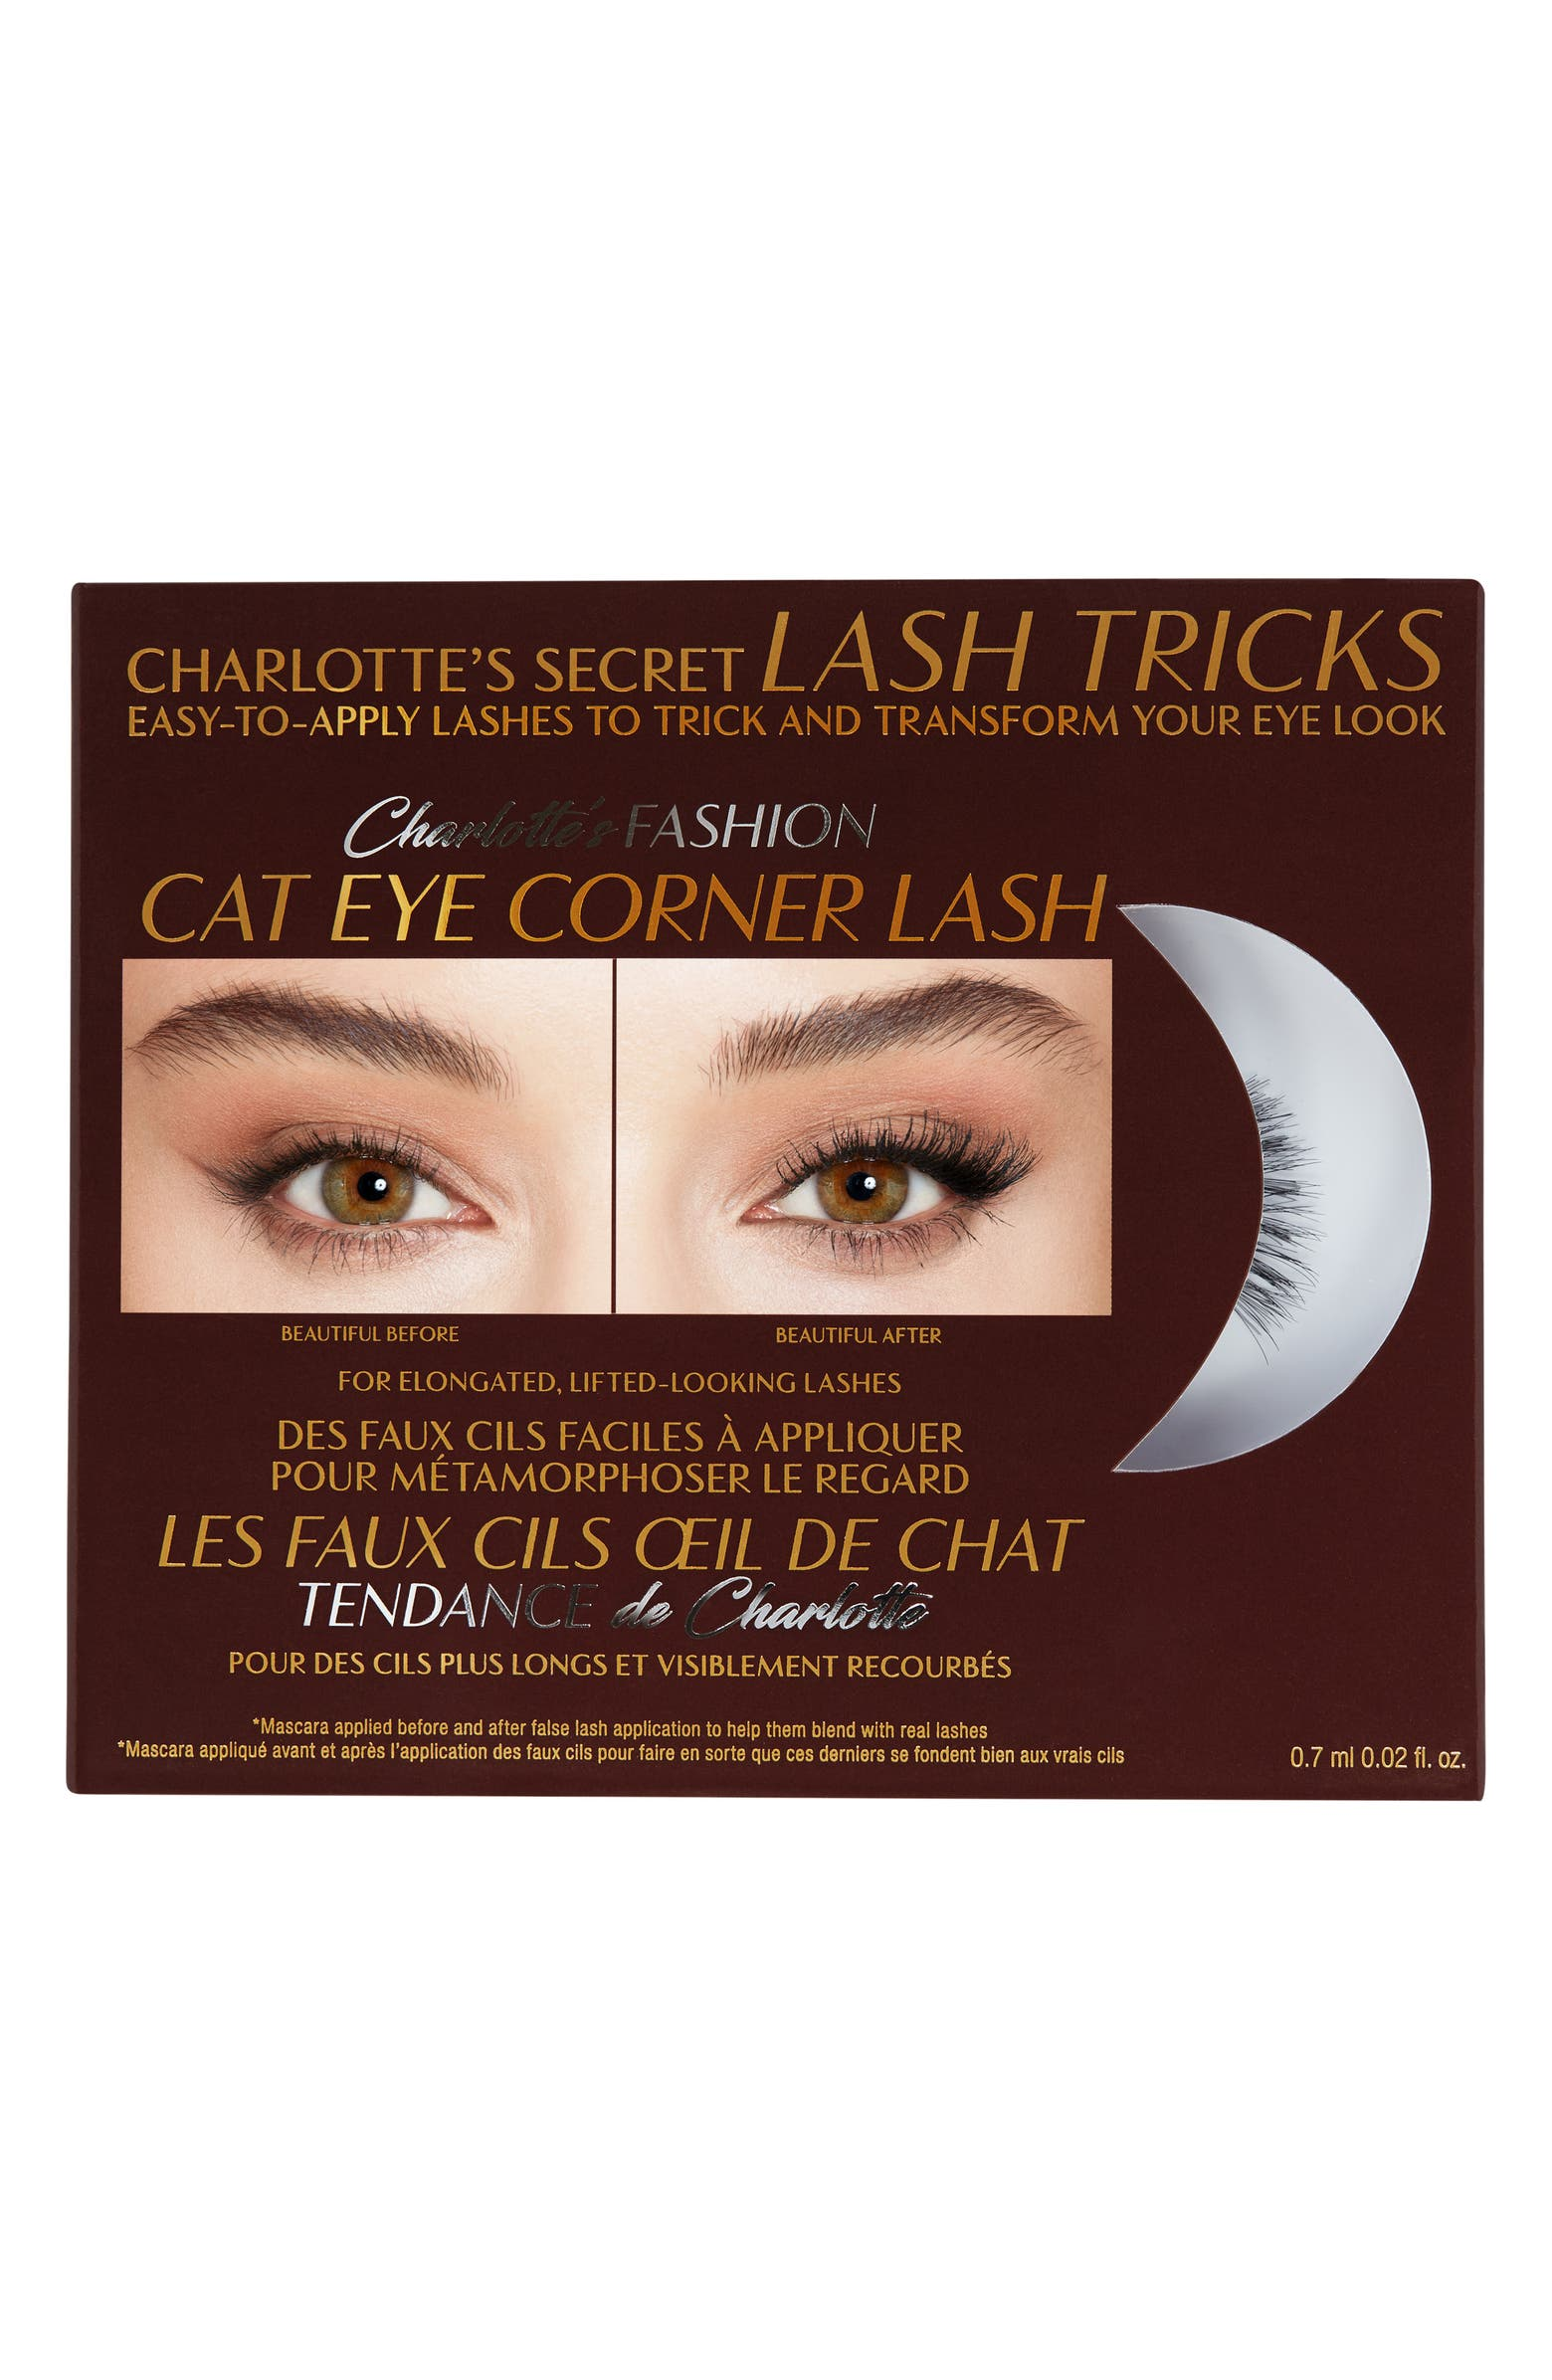 Fashion Cat Eye Corner Lash False Lashes CHARLOTTE TILBURY